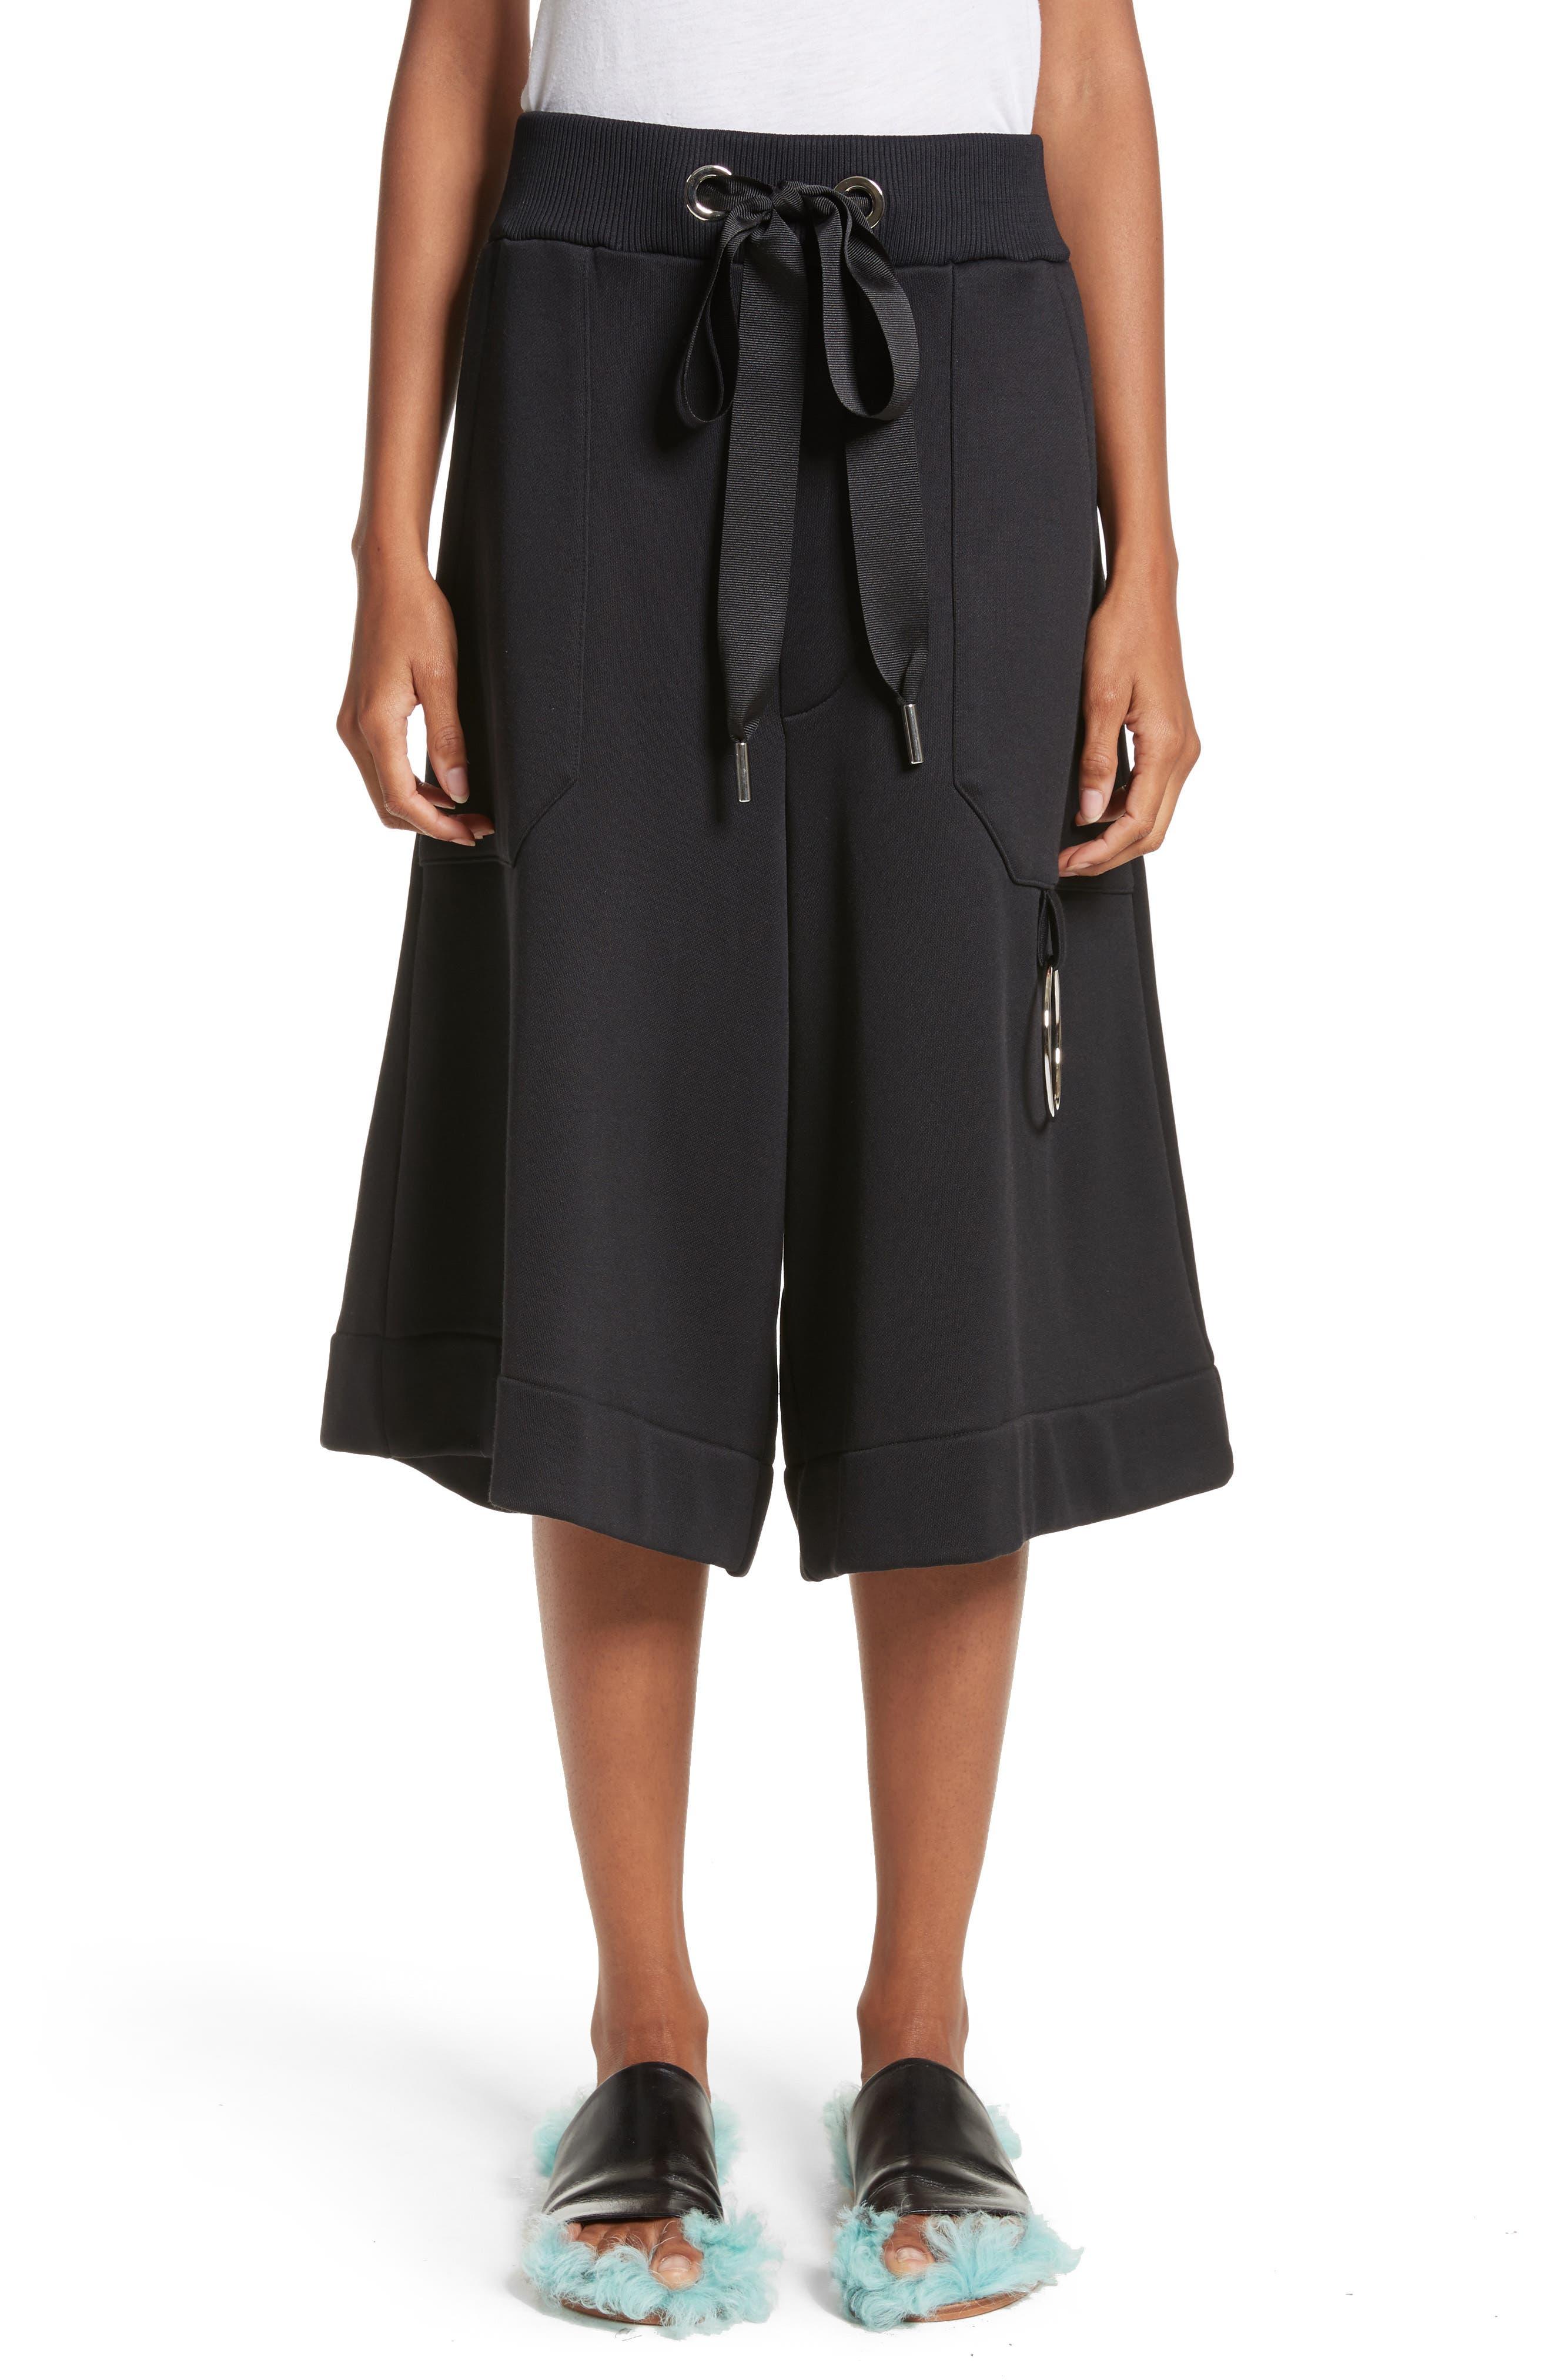 Marques'Almeida Tracksuit Wide Leg Fleece Shorts,                         Main,                         color, 001